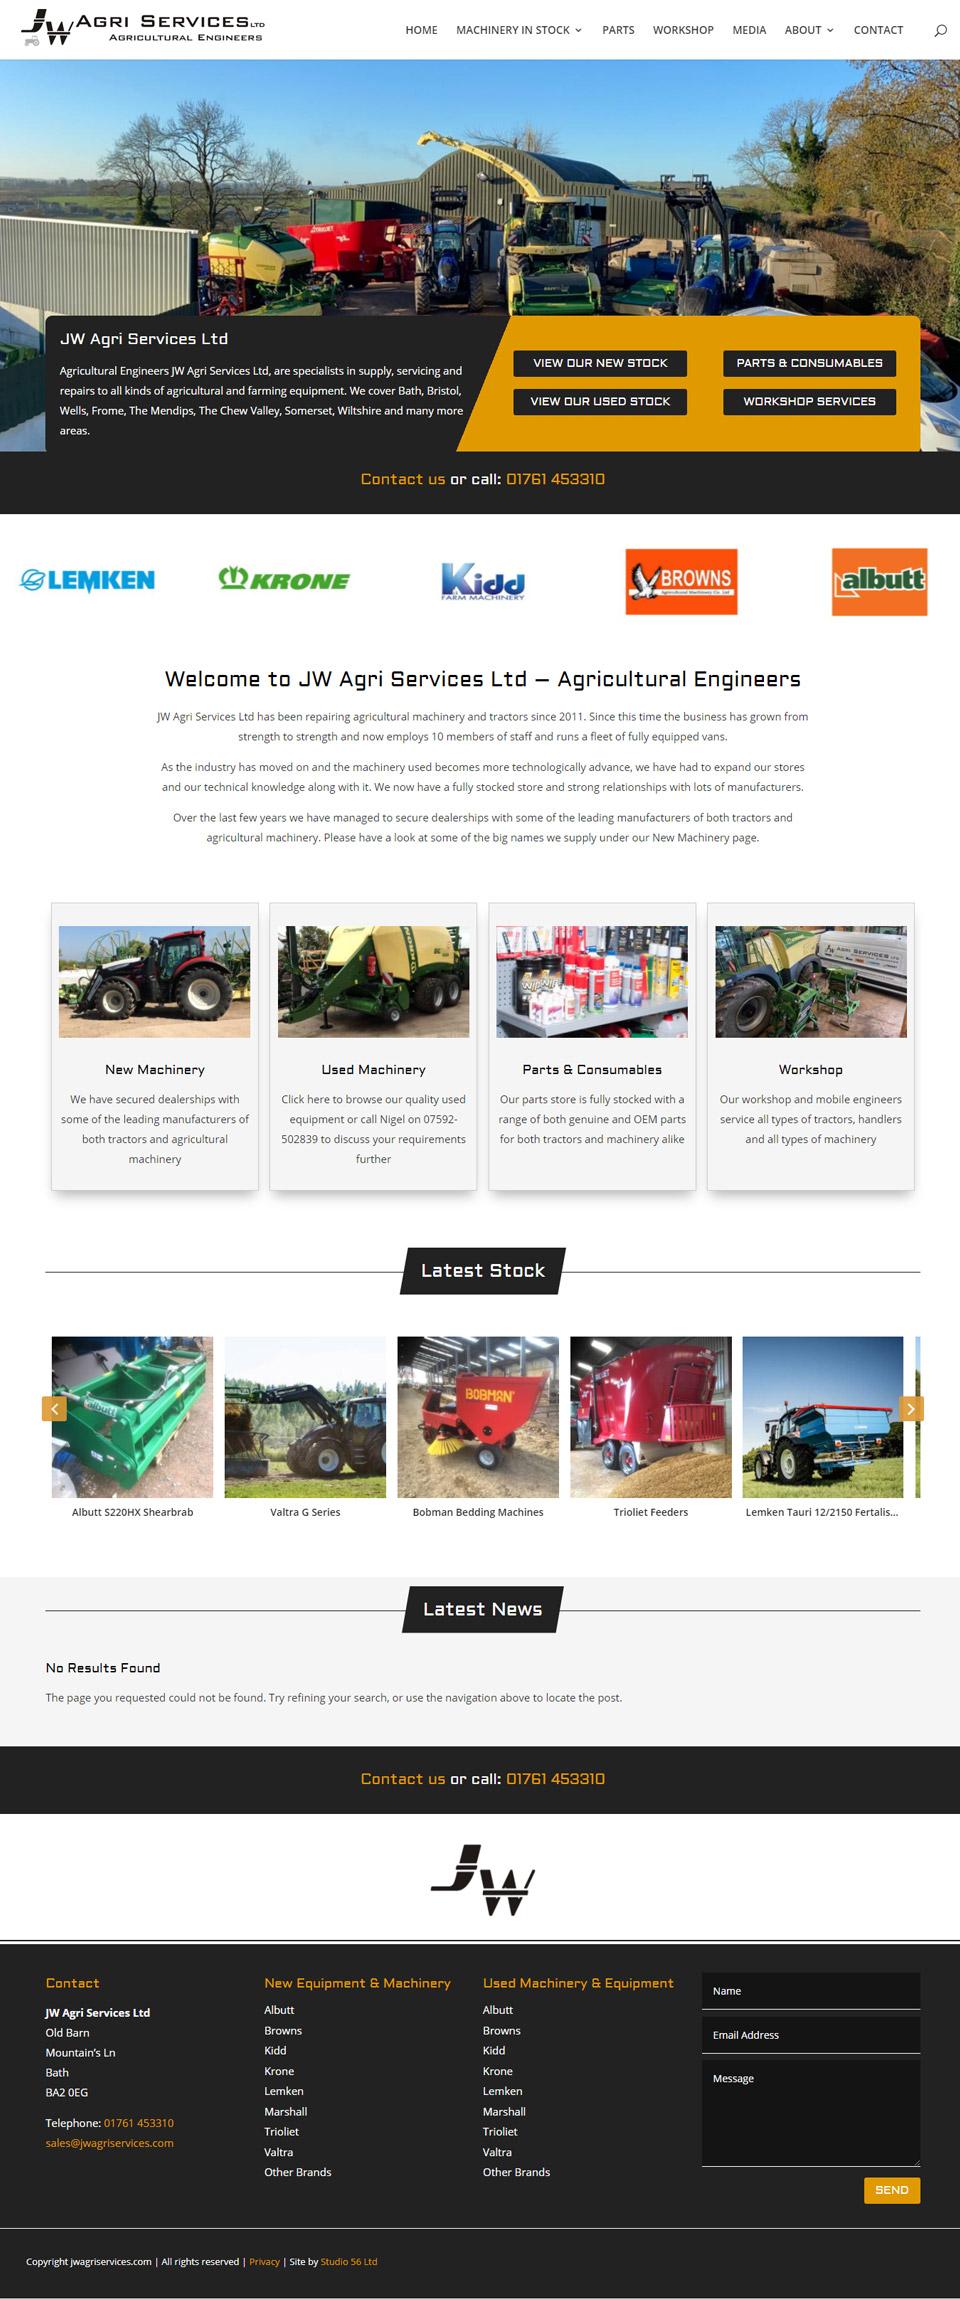 JW Agri Services website design by Studio 56 in Birmingham UK